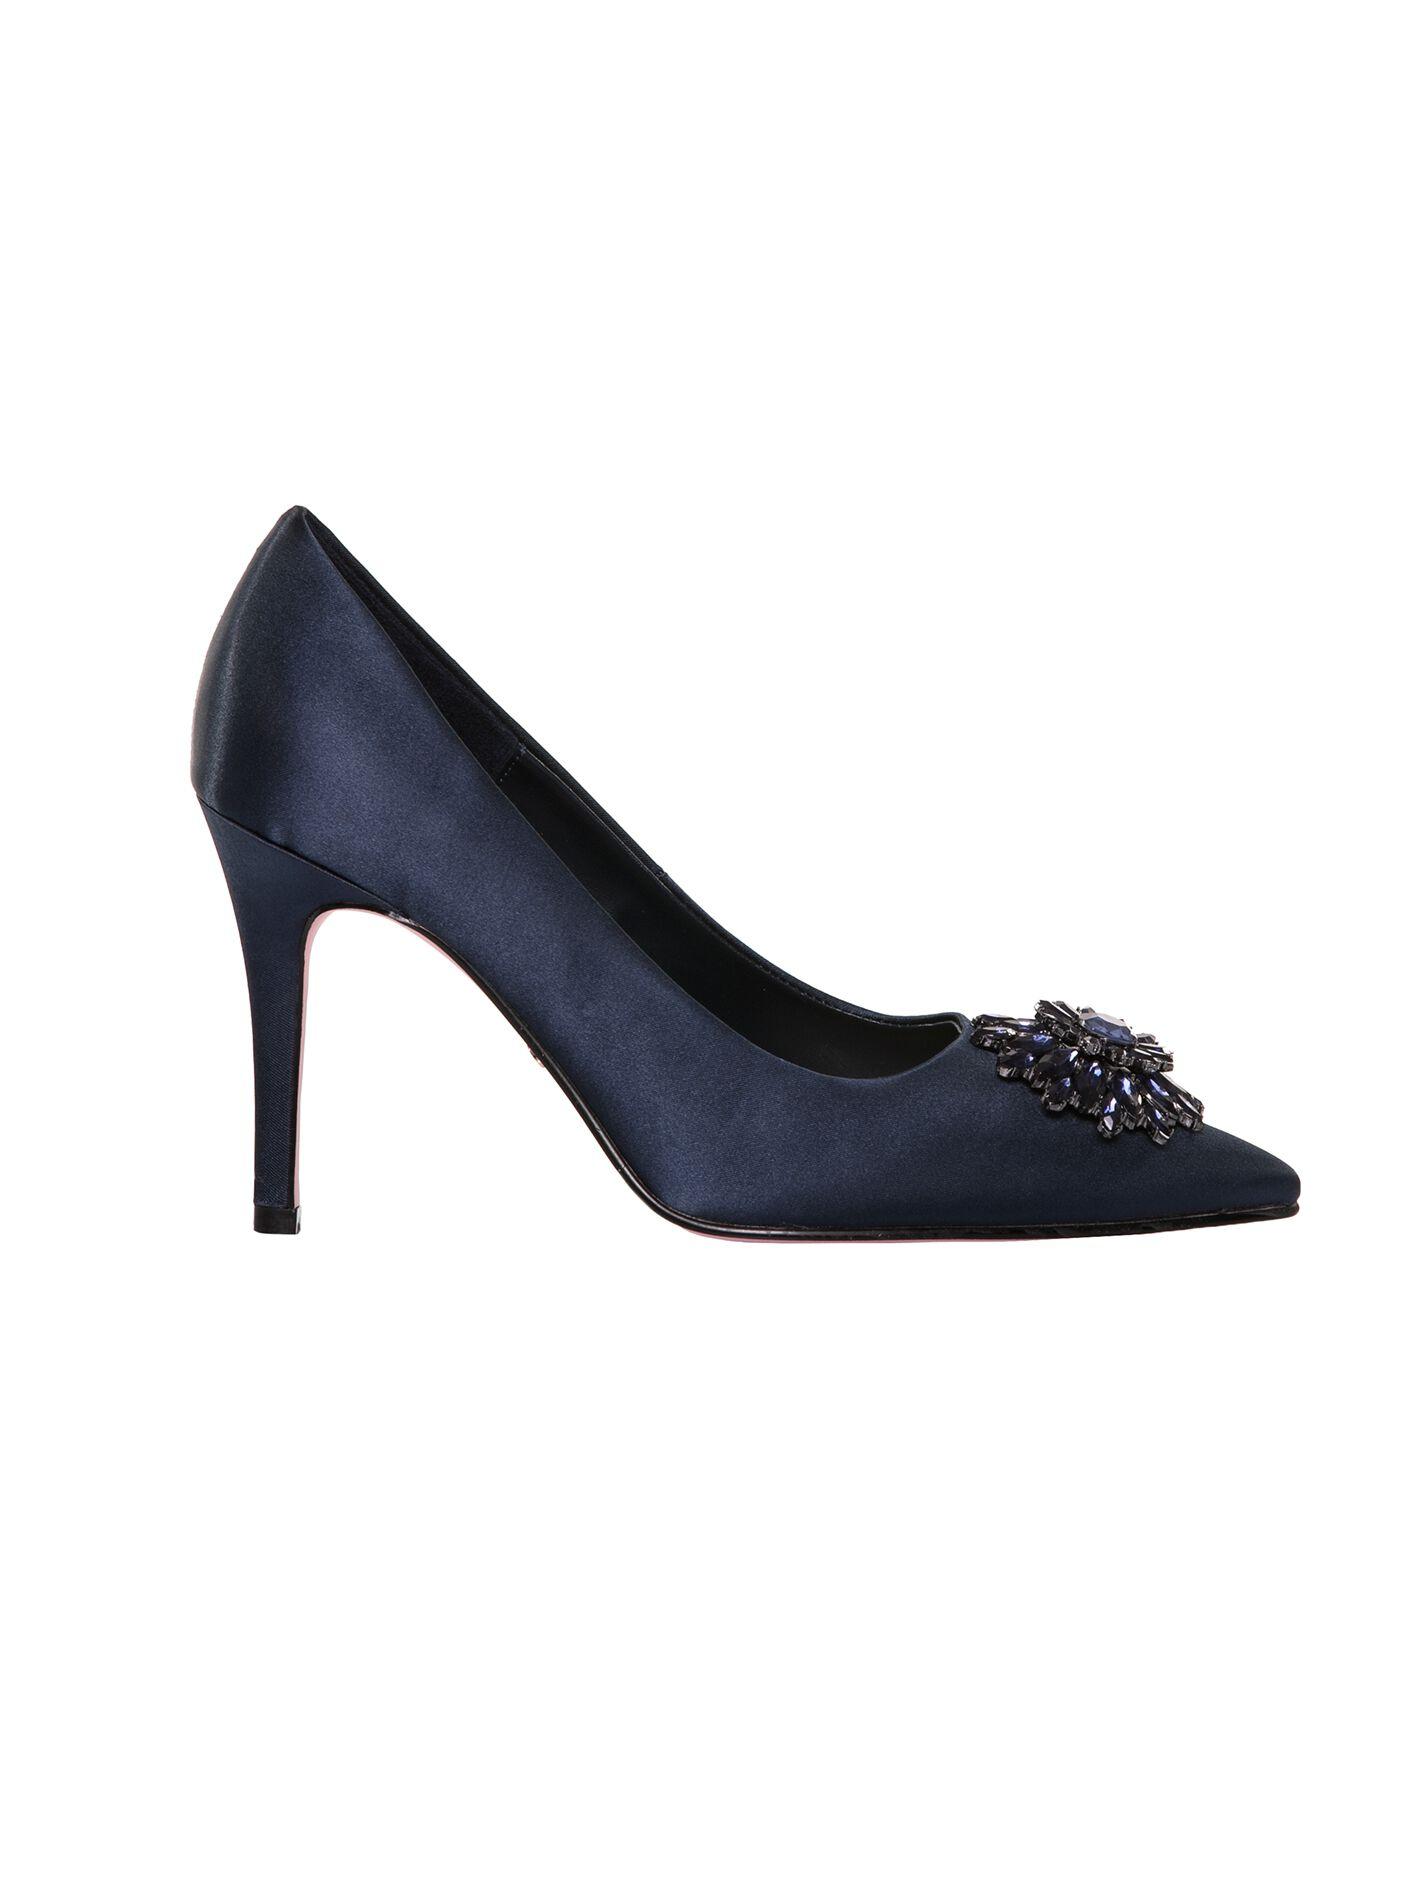 Darcy Pump/heel | Shop shoes online